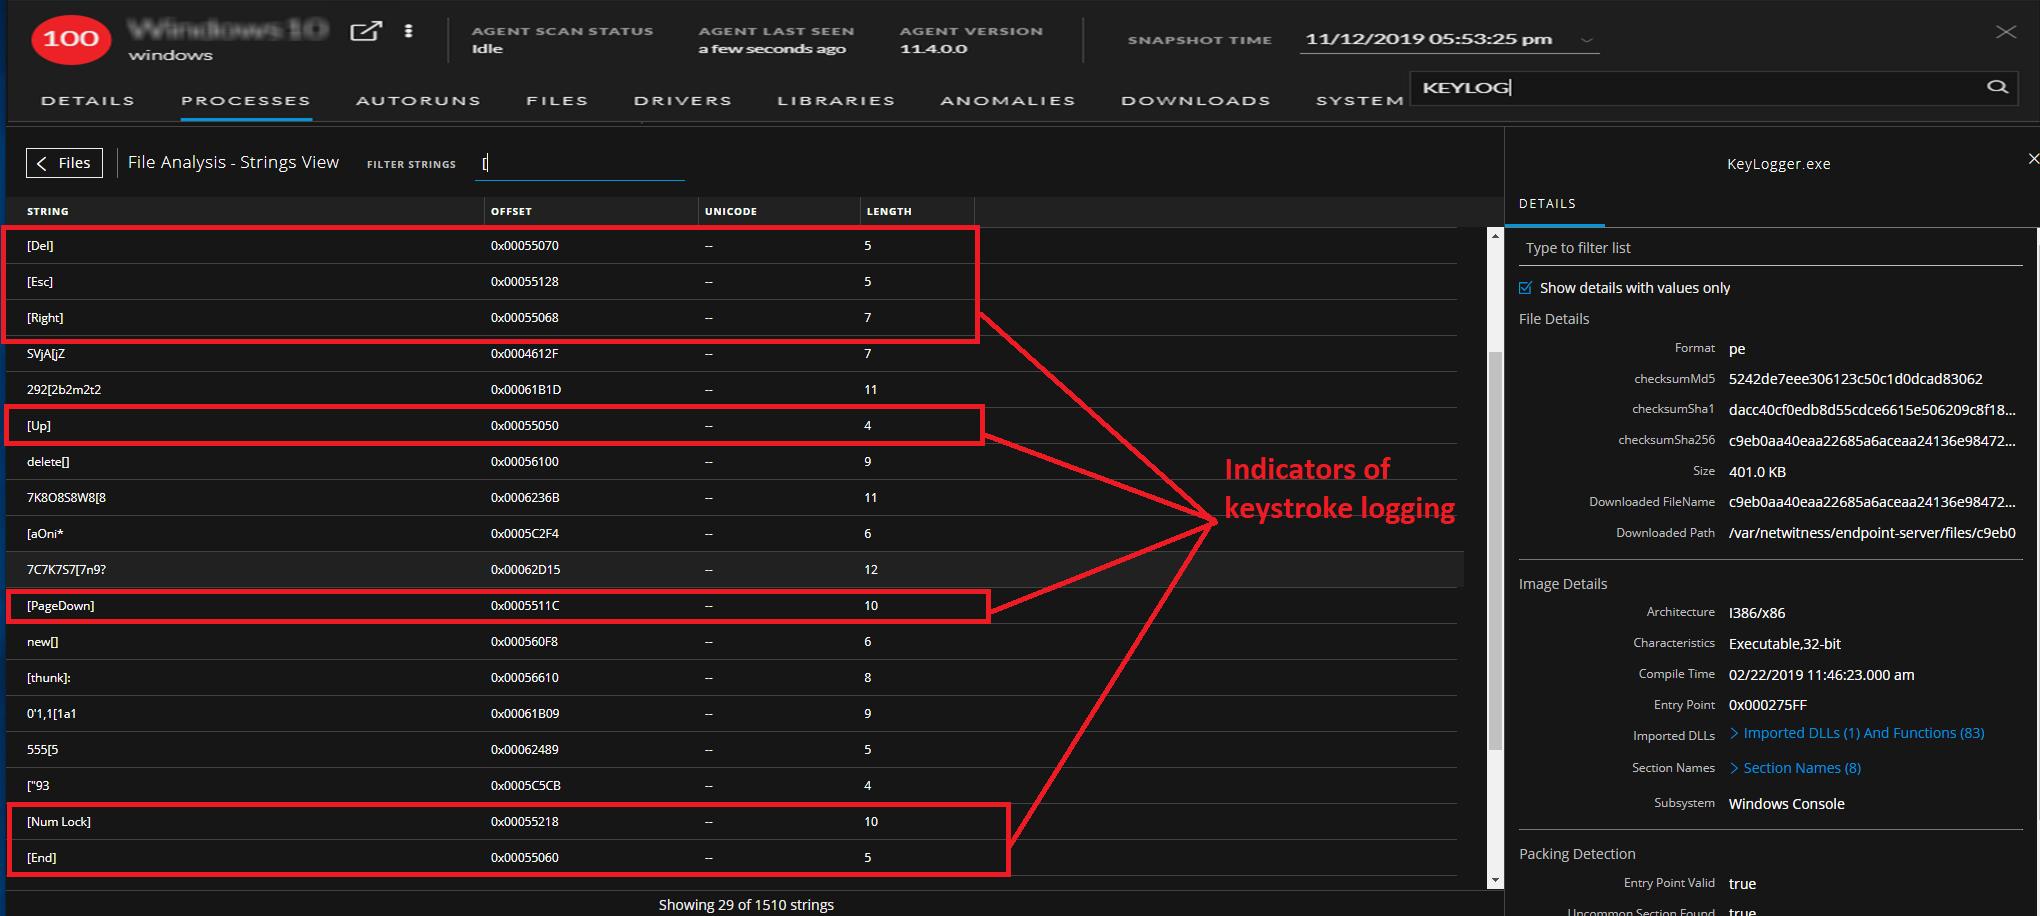 Indicators of keystroke logging